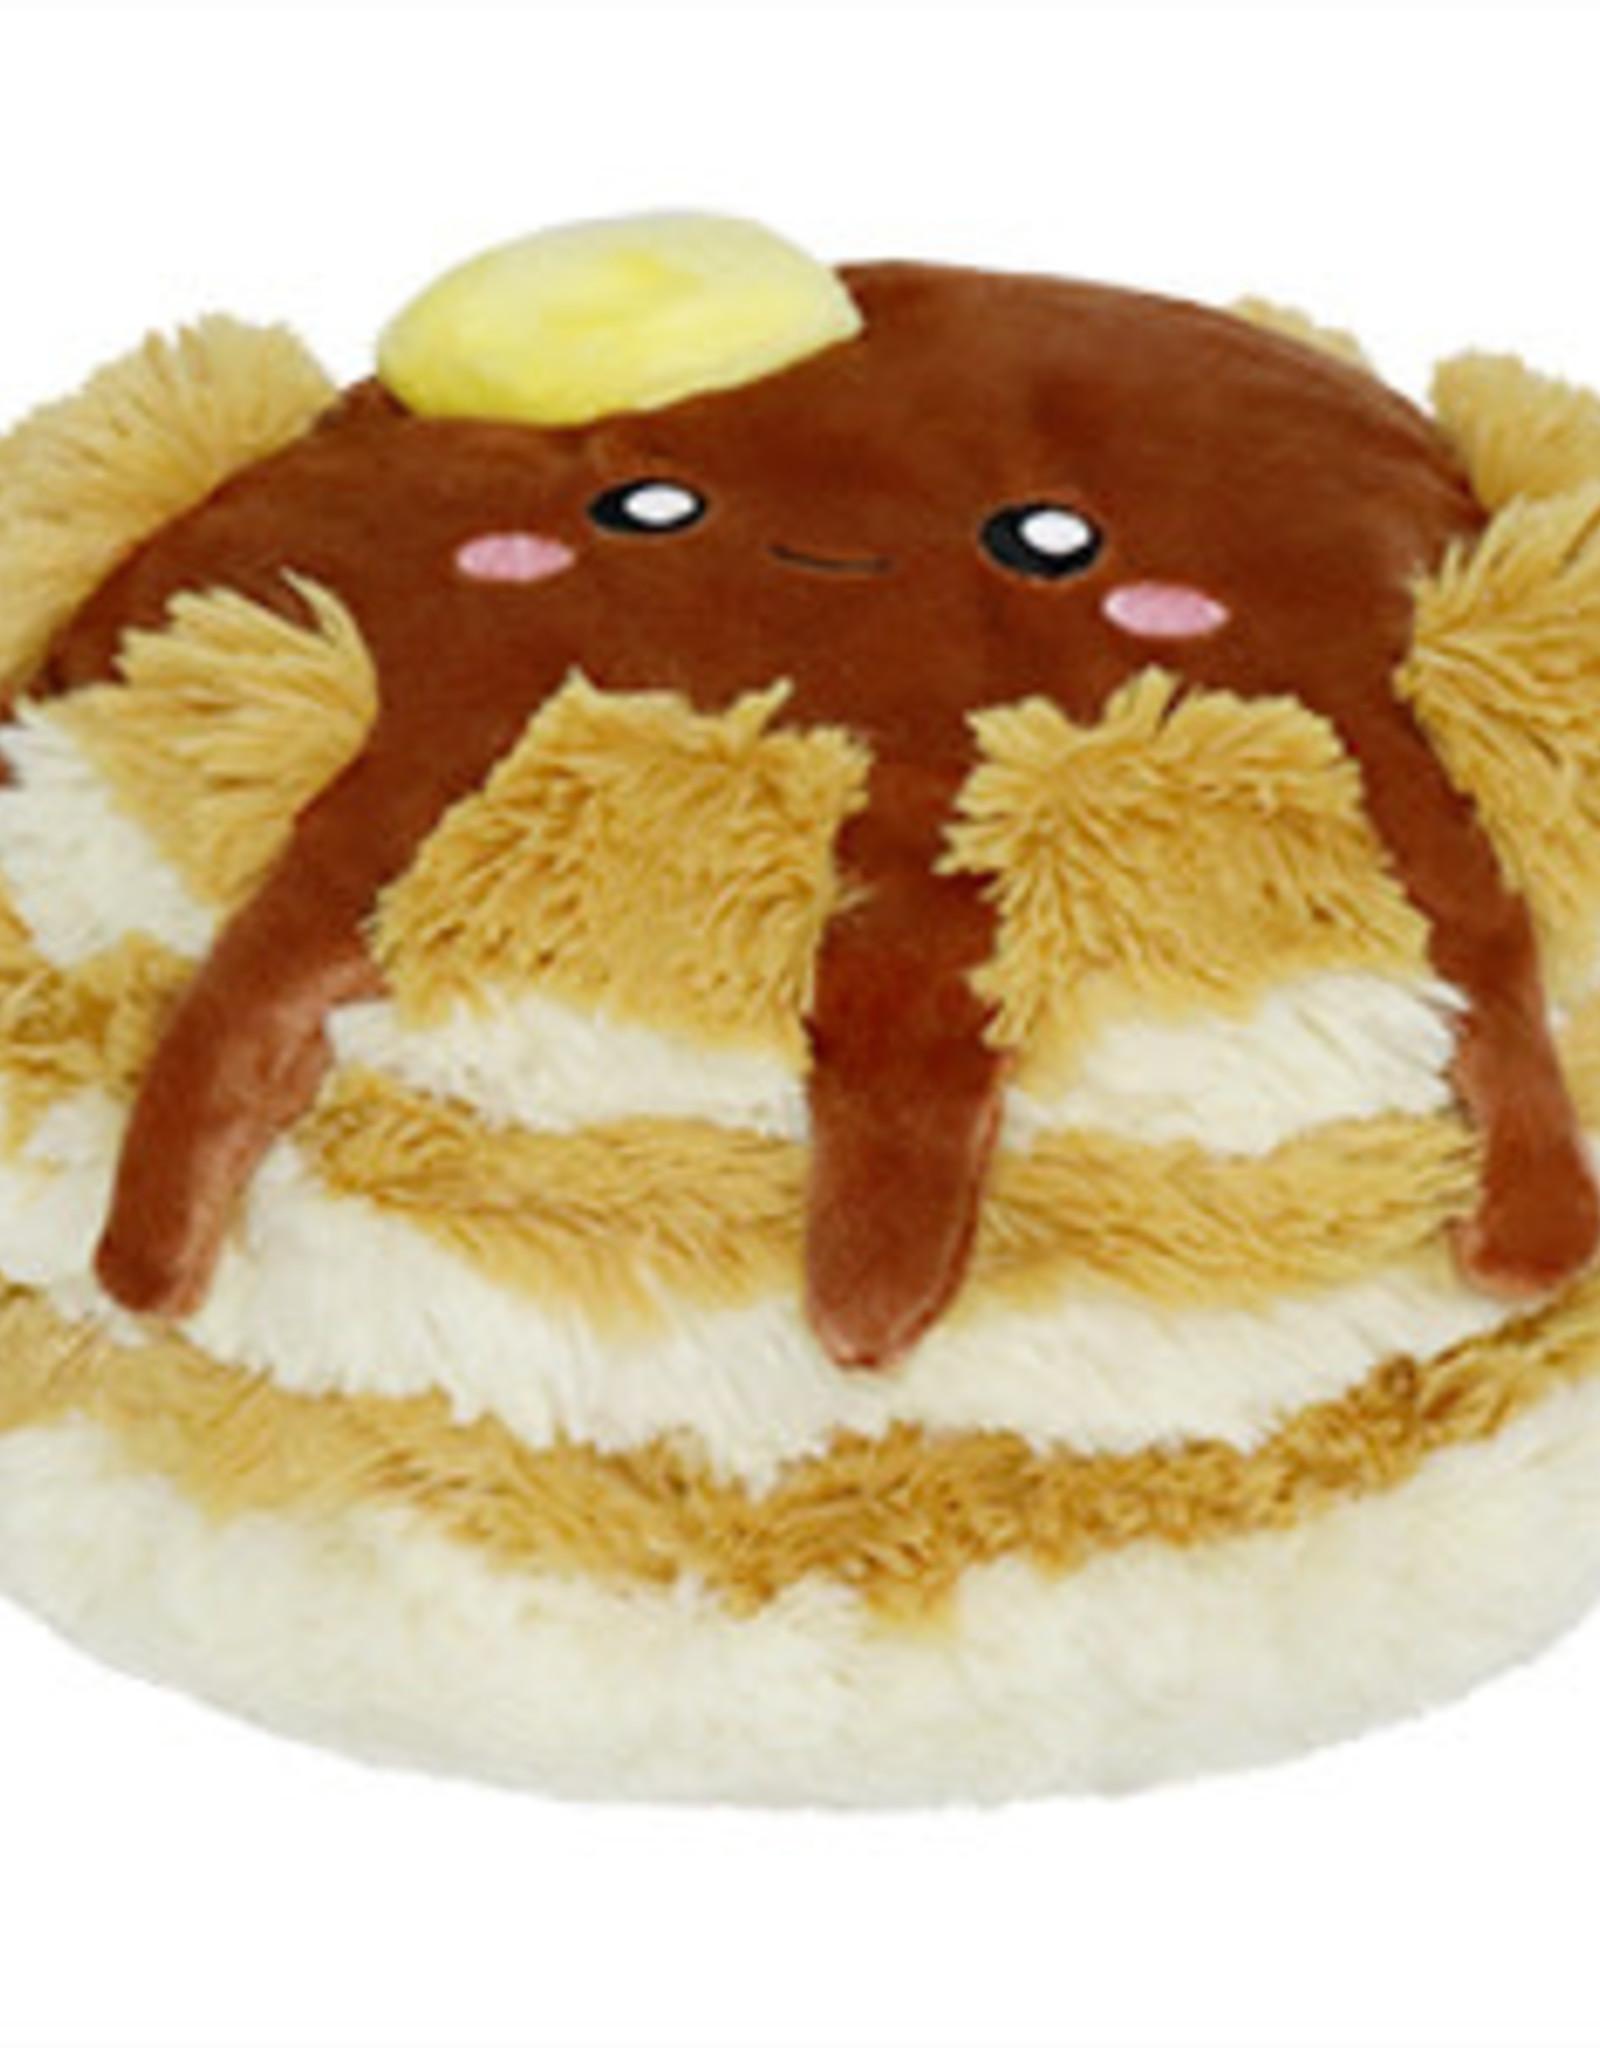 Squishable Mini Comfort Food Pancakes